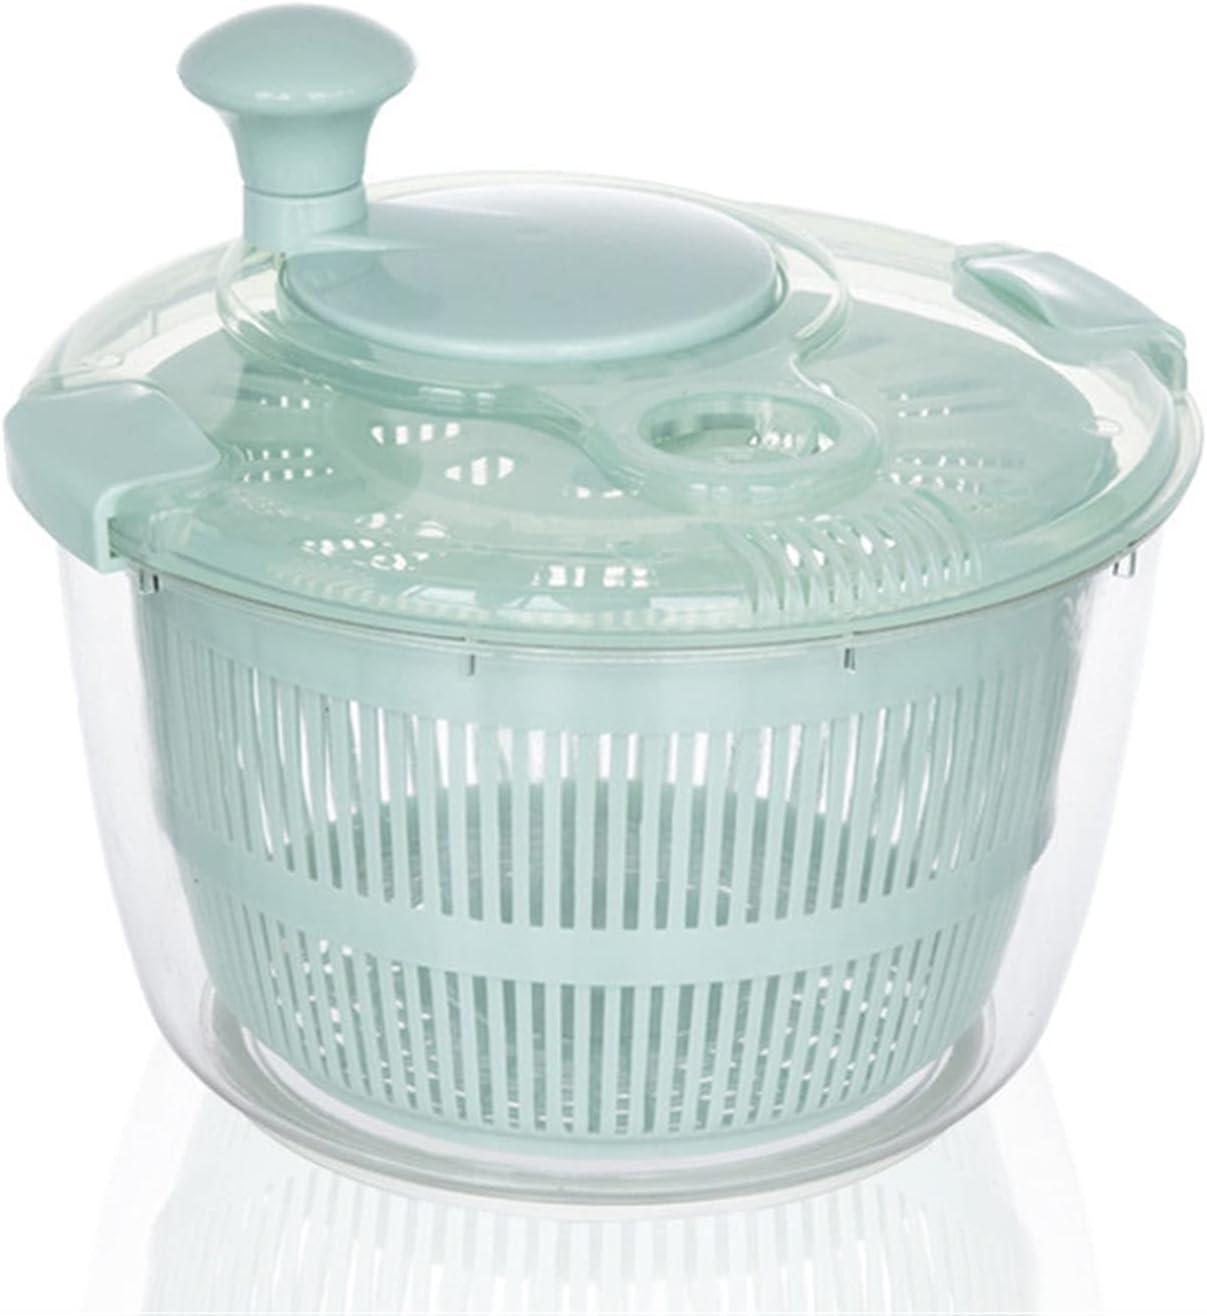 Salad Spinner Be super welcome Vegetable excellence dryer vegetable fruit cleaner sala and